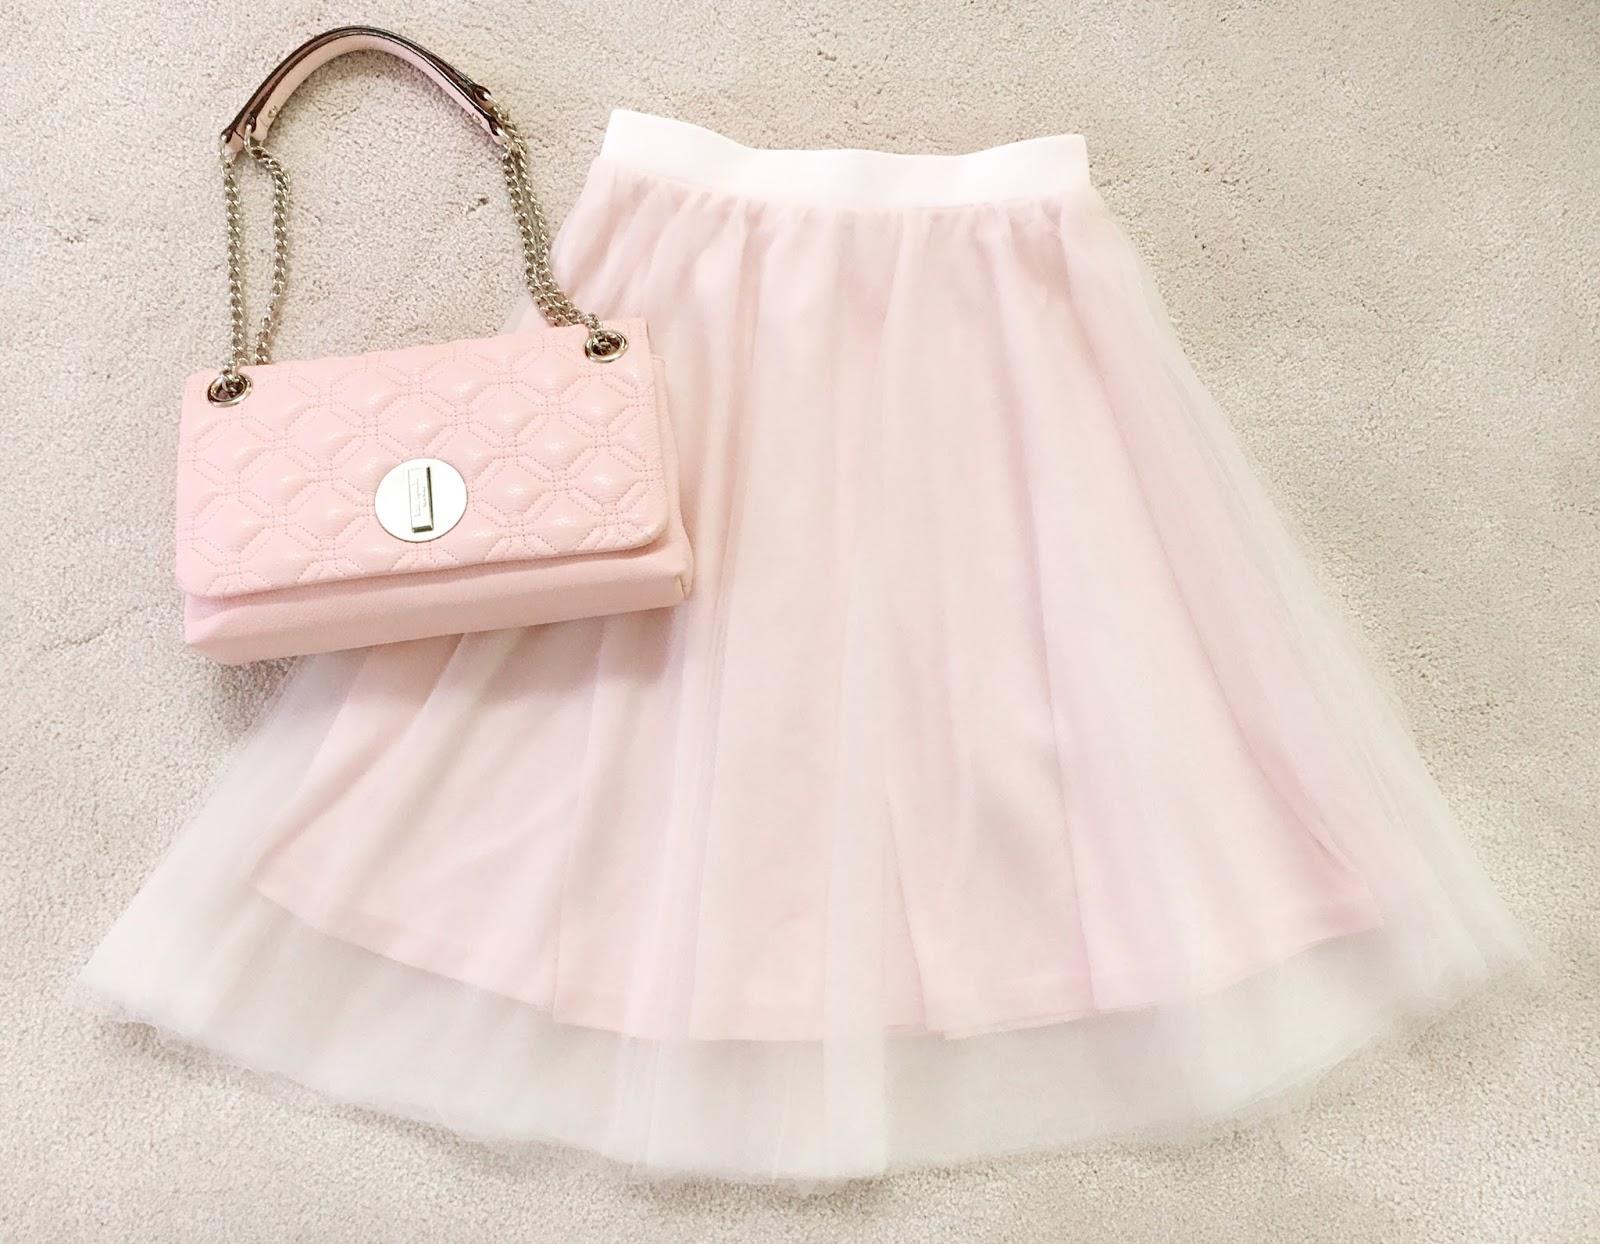 aa48674767 I saw this slightly longer (knee length +, depending on the wearer's  height) skirt start making major appearances for Liz Lisa in Spring 2014  and just ...